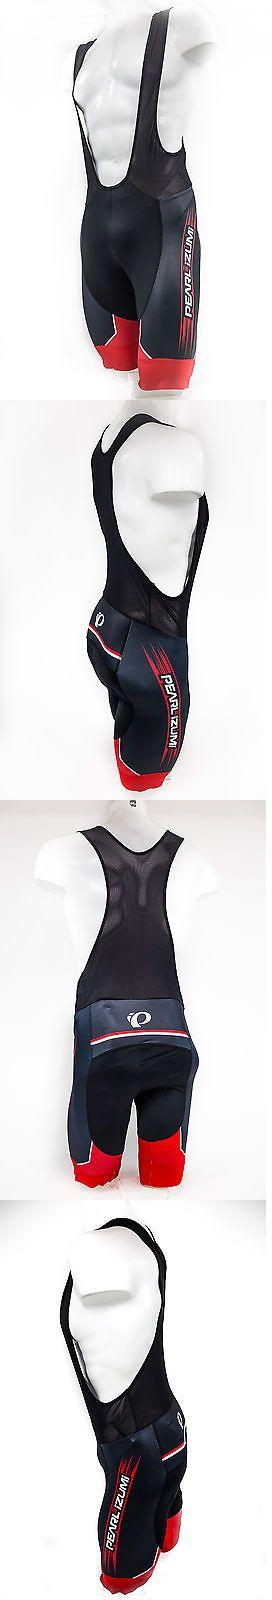 Shorts 177853: Pearl Izumi 2017 Elite Pursuit Ltd Bike Cycling Bib Shorts Black True Red,Medium -> BUY IT NOW ONLY: $95.87 on eBay!